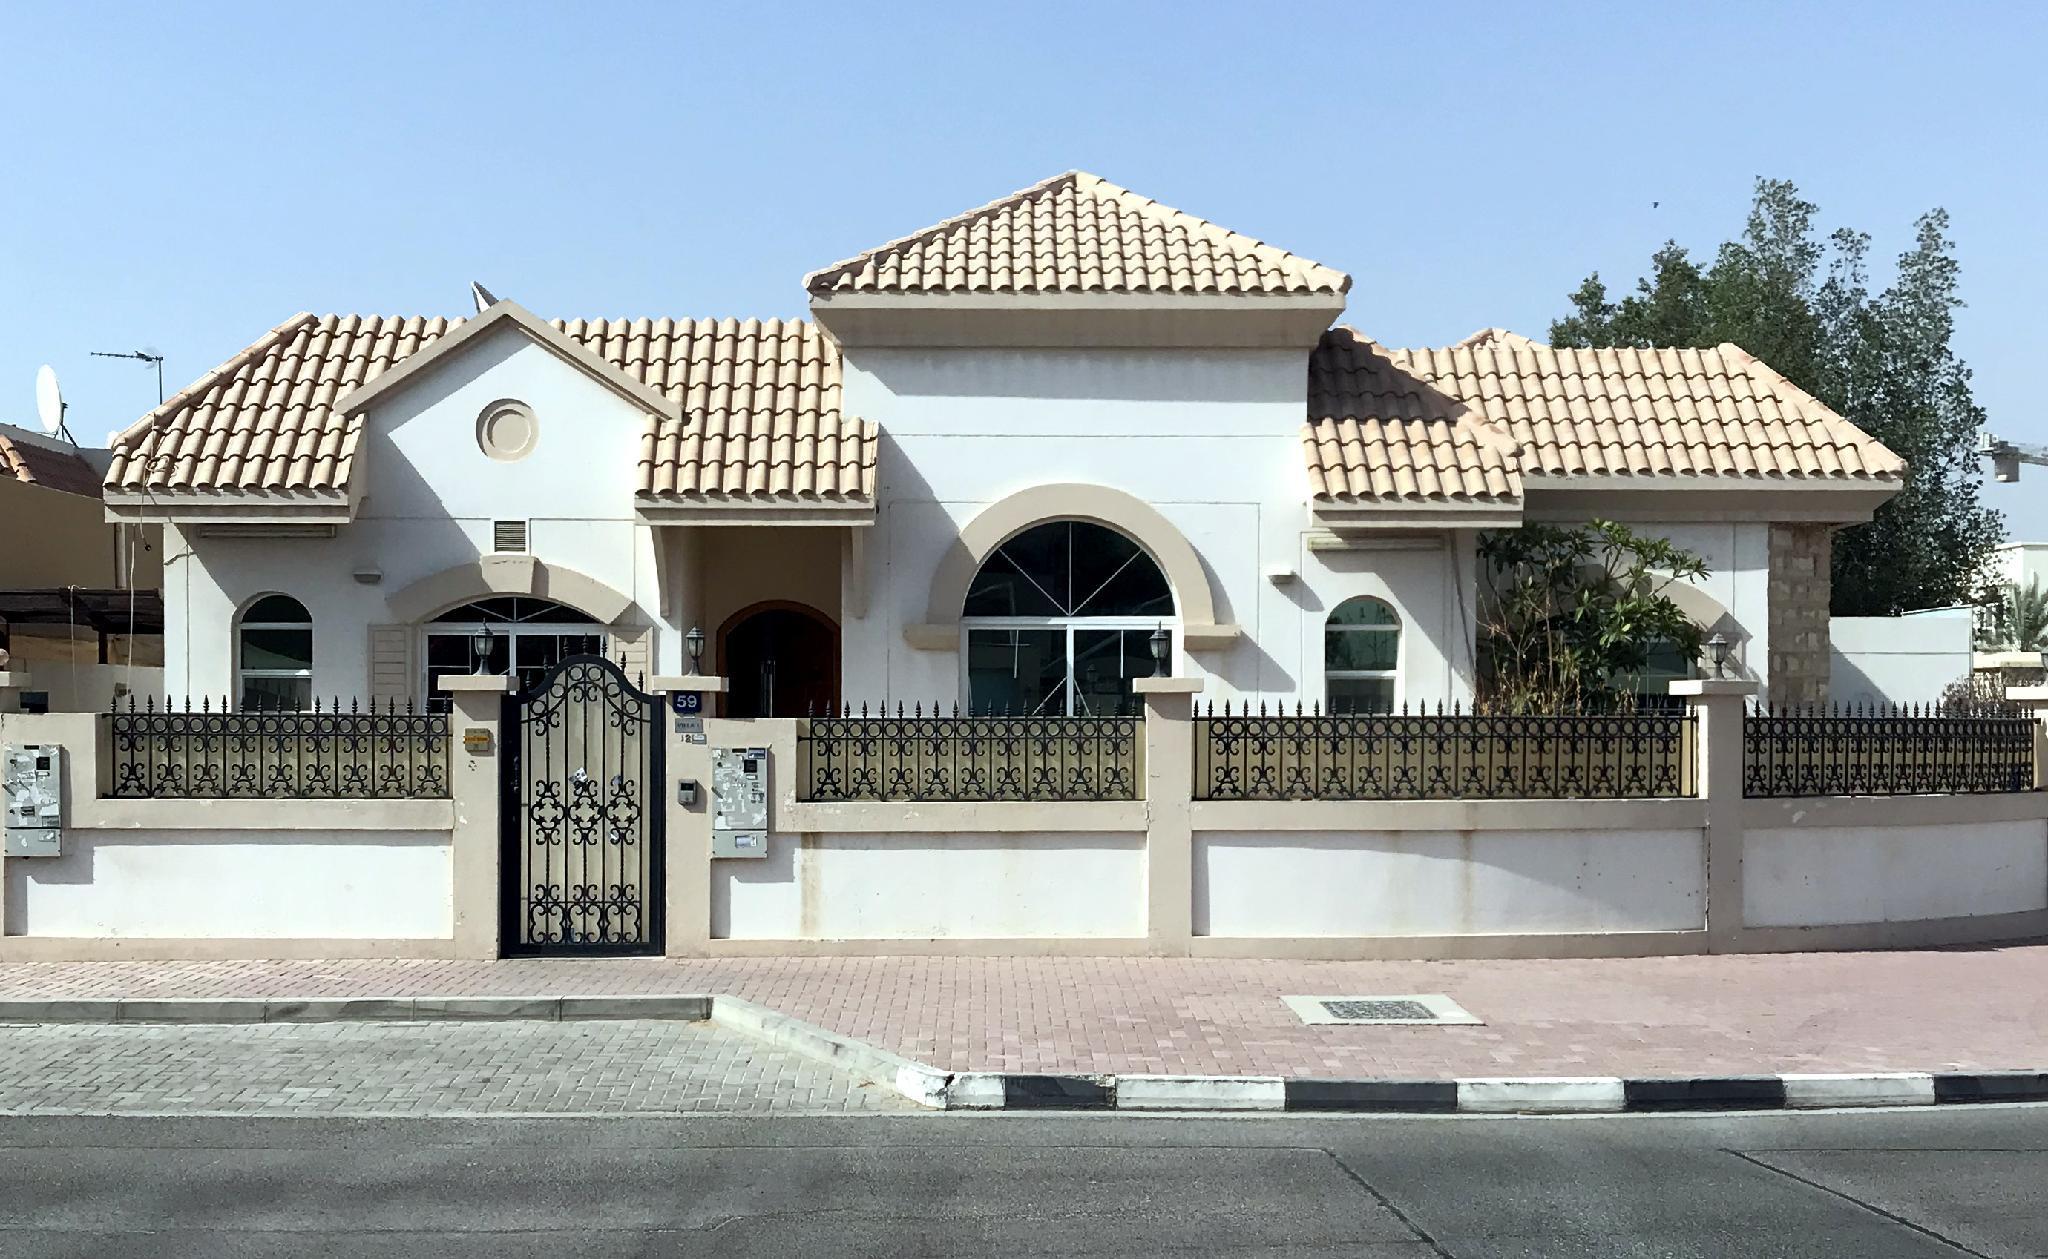 Top 20 Villas Beach Houses Resorts In Dubai Staylist